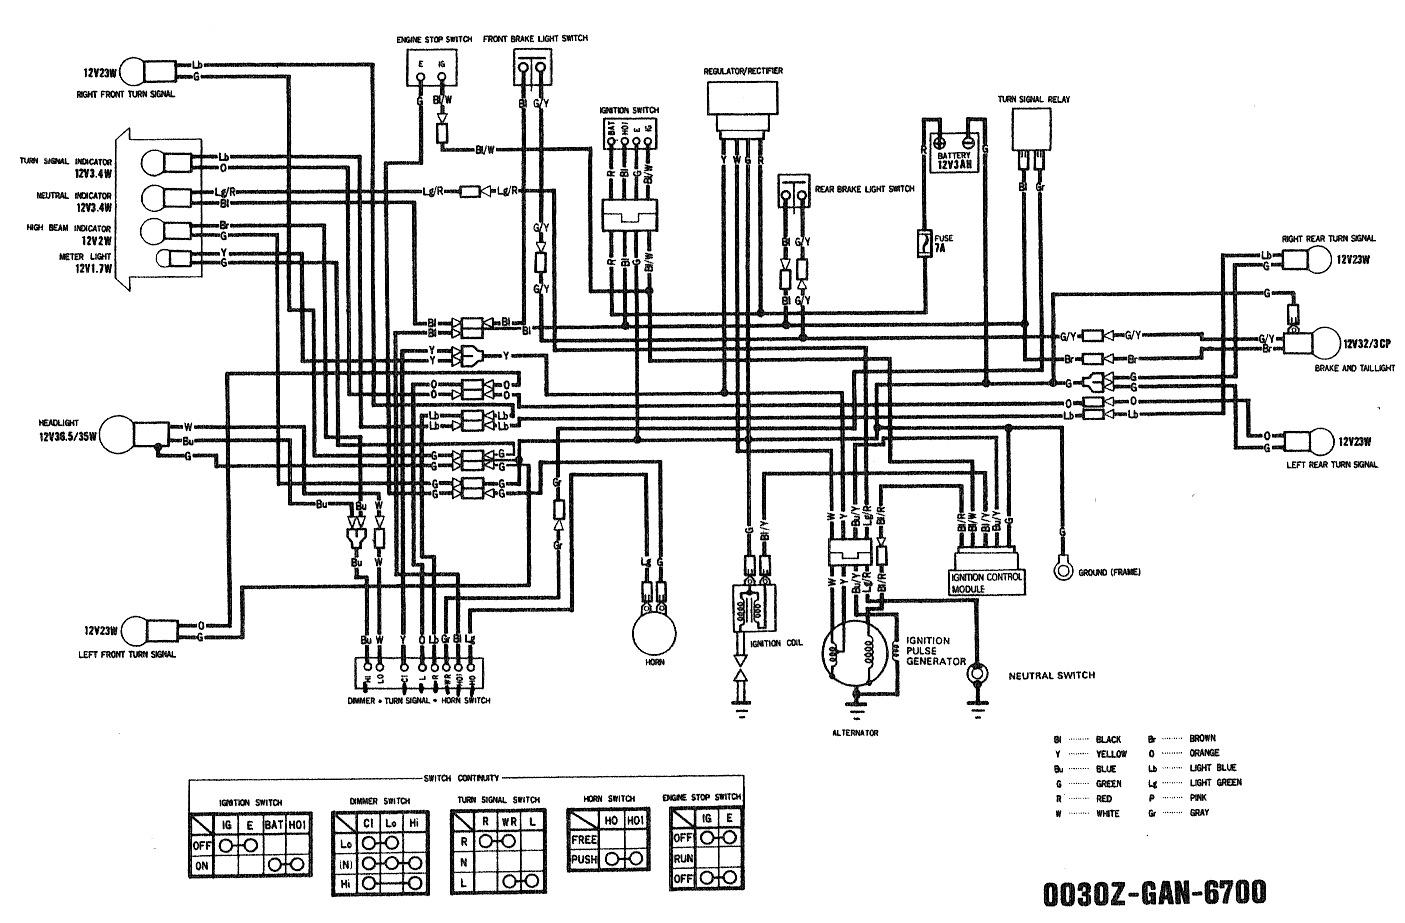 wiring diagram honda cl350 k4